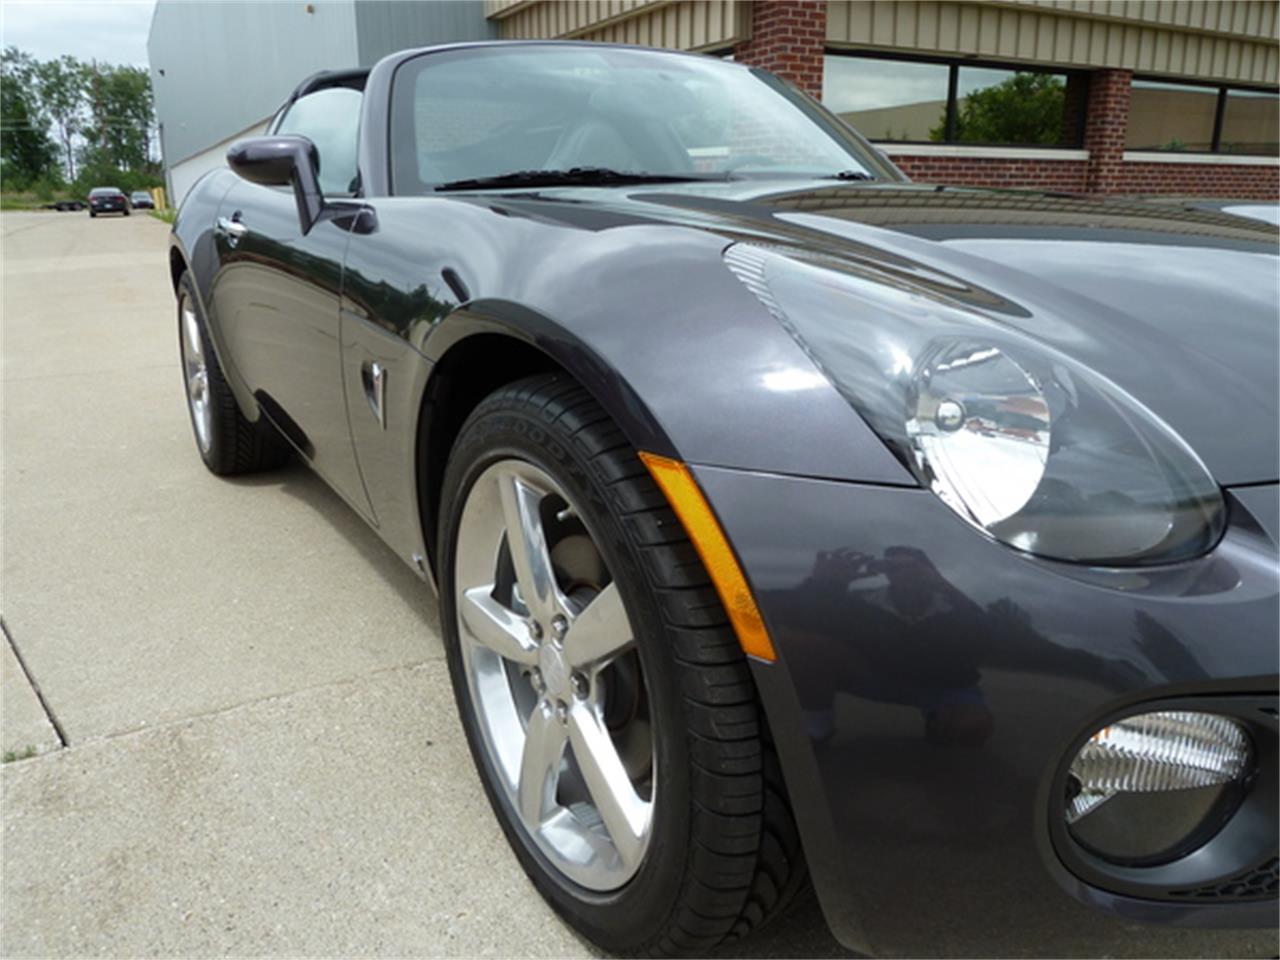 2010 Pontiac Solstice (CC-1319516) for sale in Macomb, Michigan